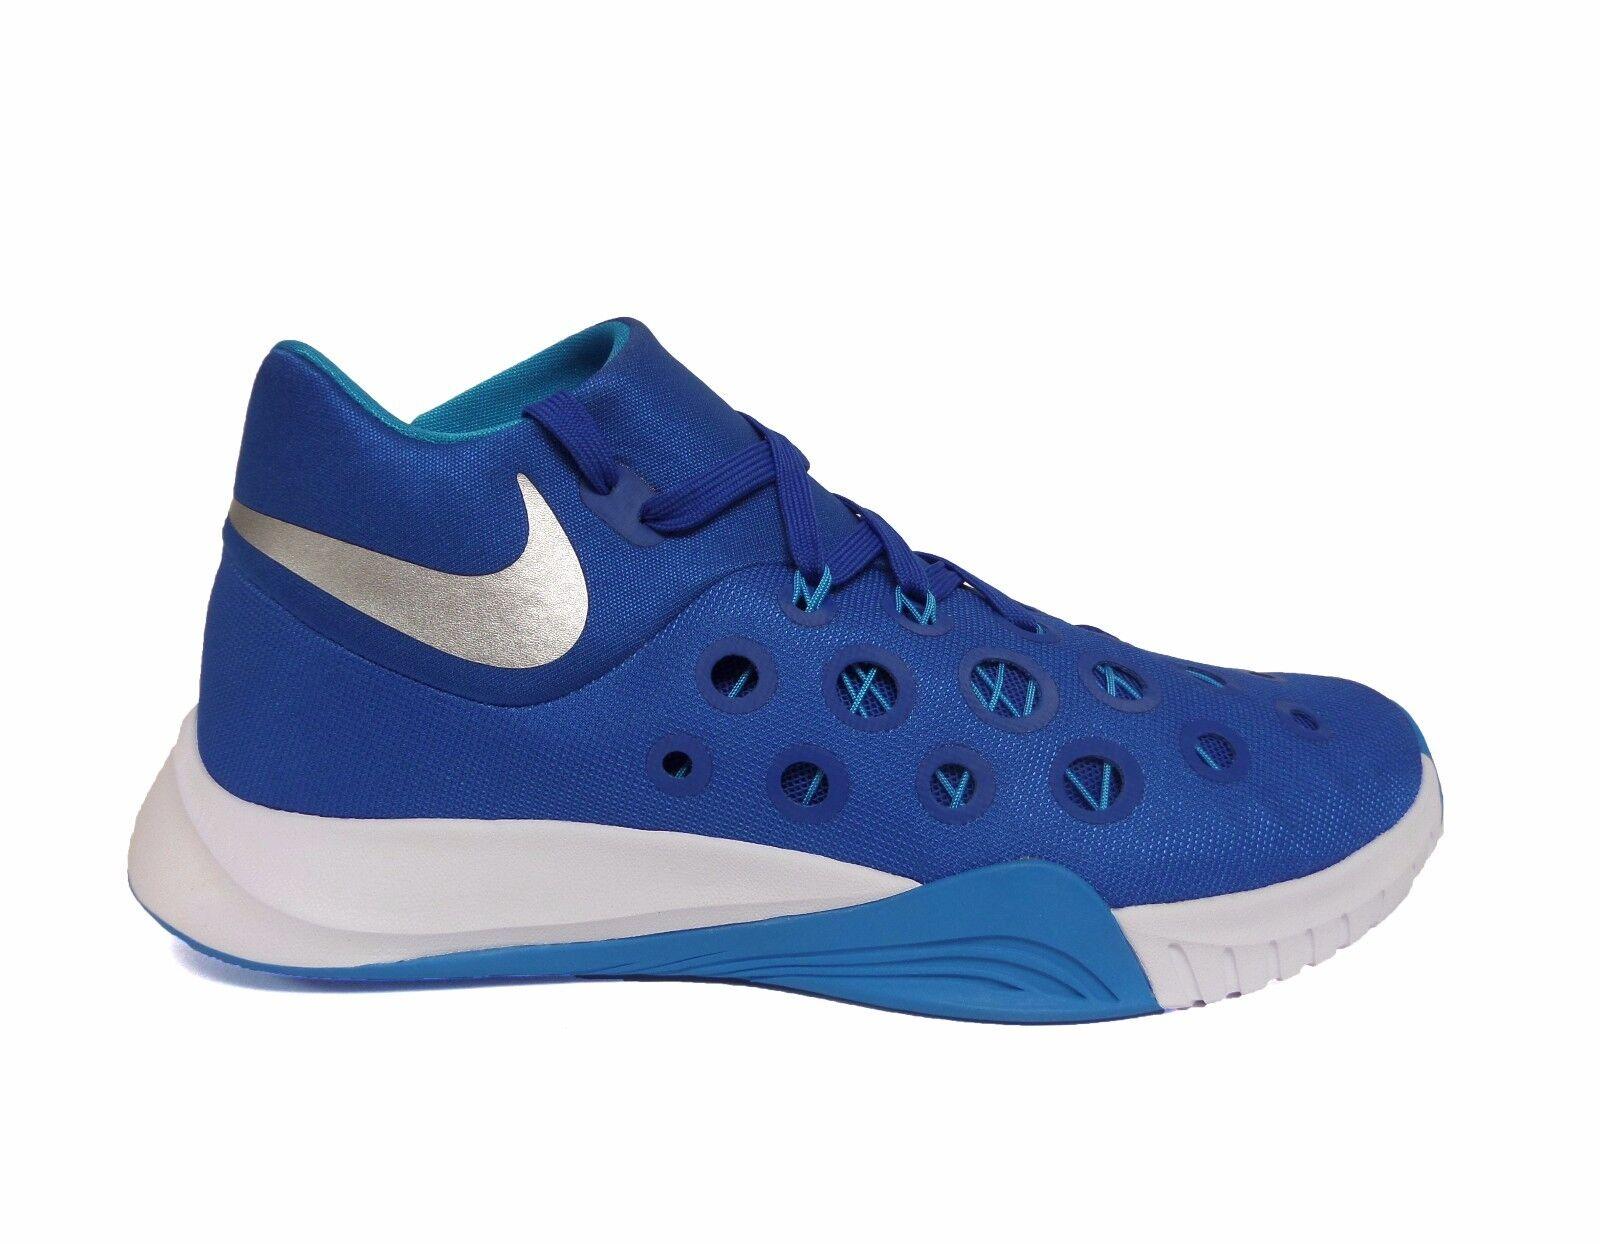 Nike maschile 2015 la dimensione scarpe 749883-404 zoom hyperquickness scarpe dimensione 8,5 m) / 10 (wmns) d0a38b